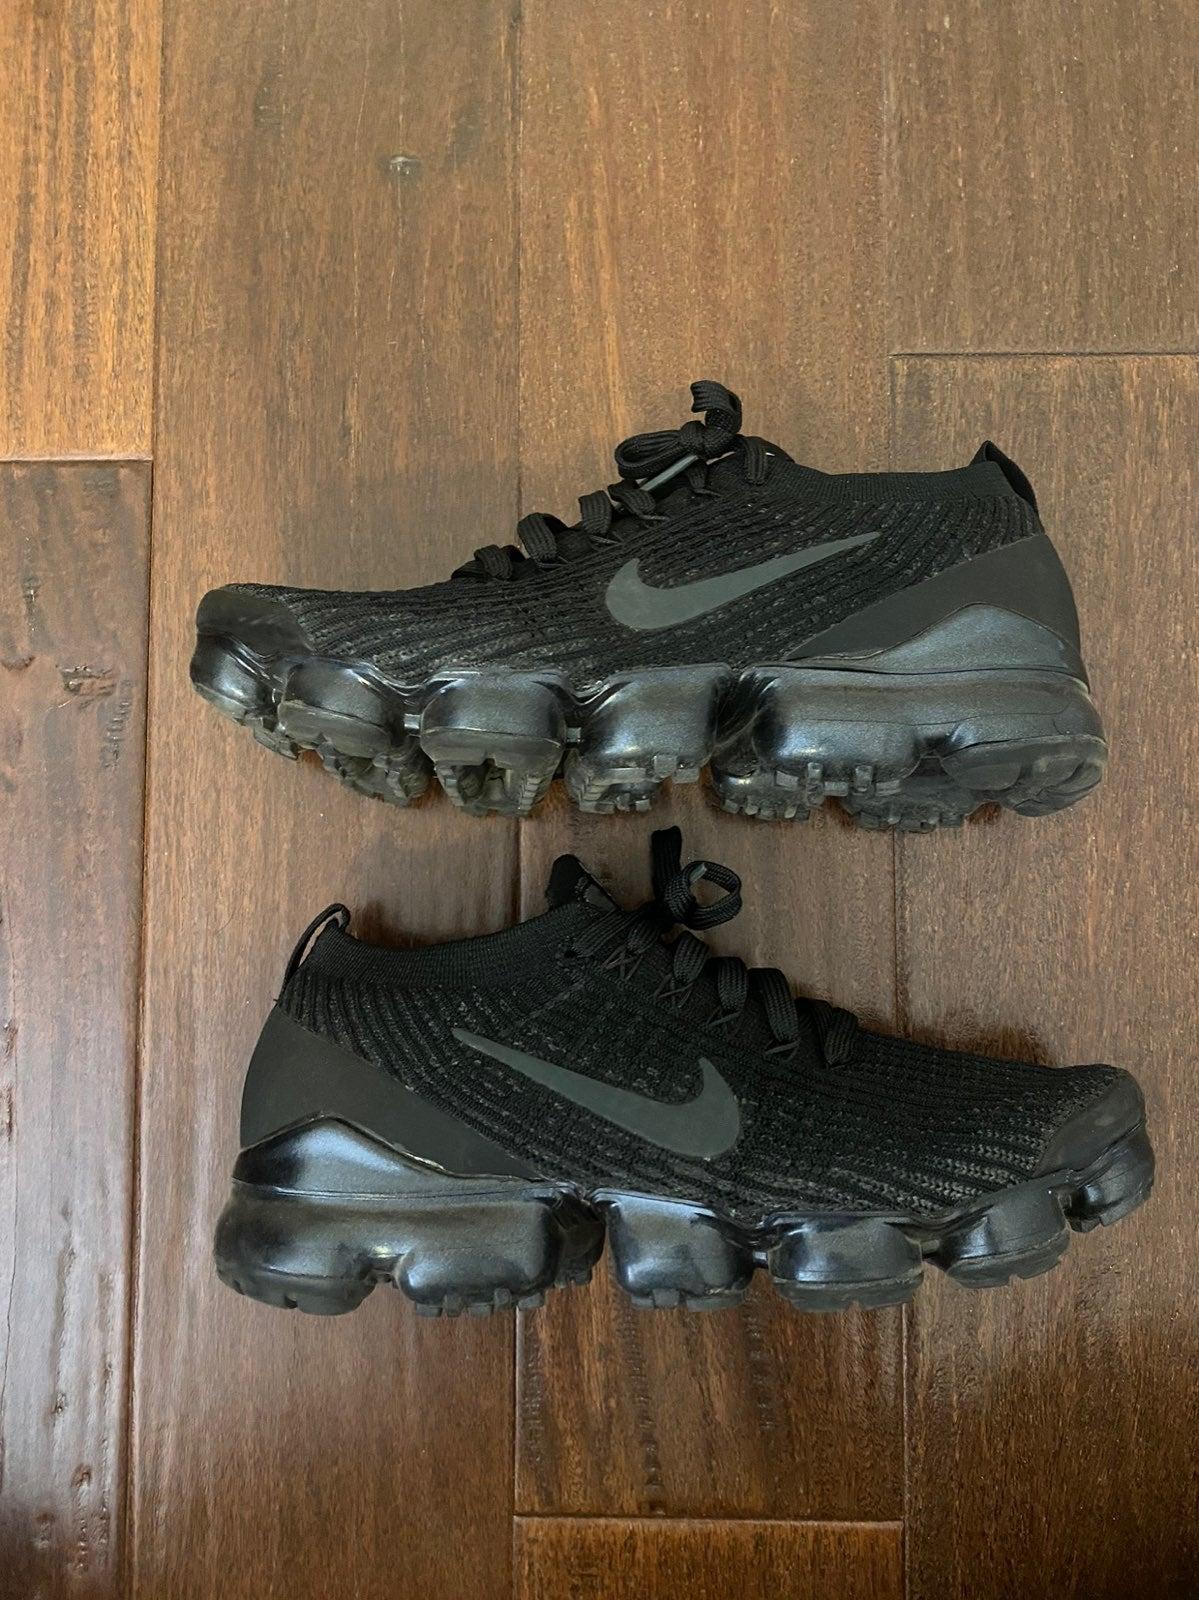 Nike Air Vapormax Flyknit 3 Black • 8.5